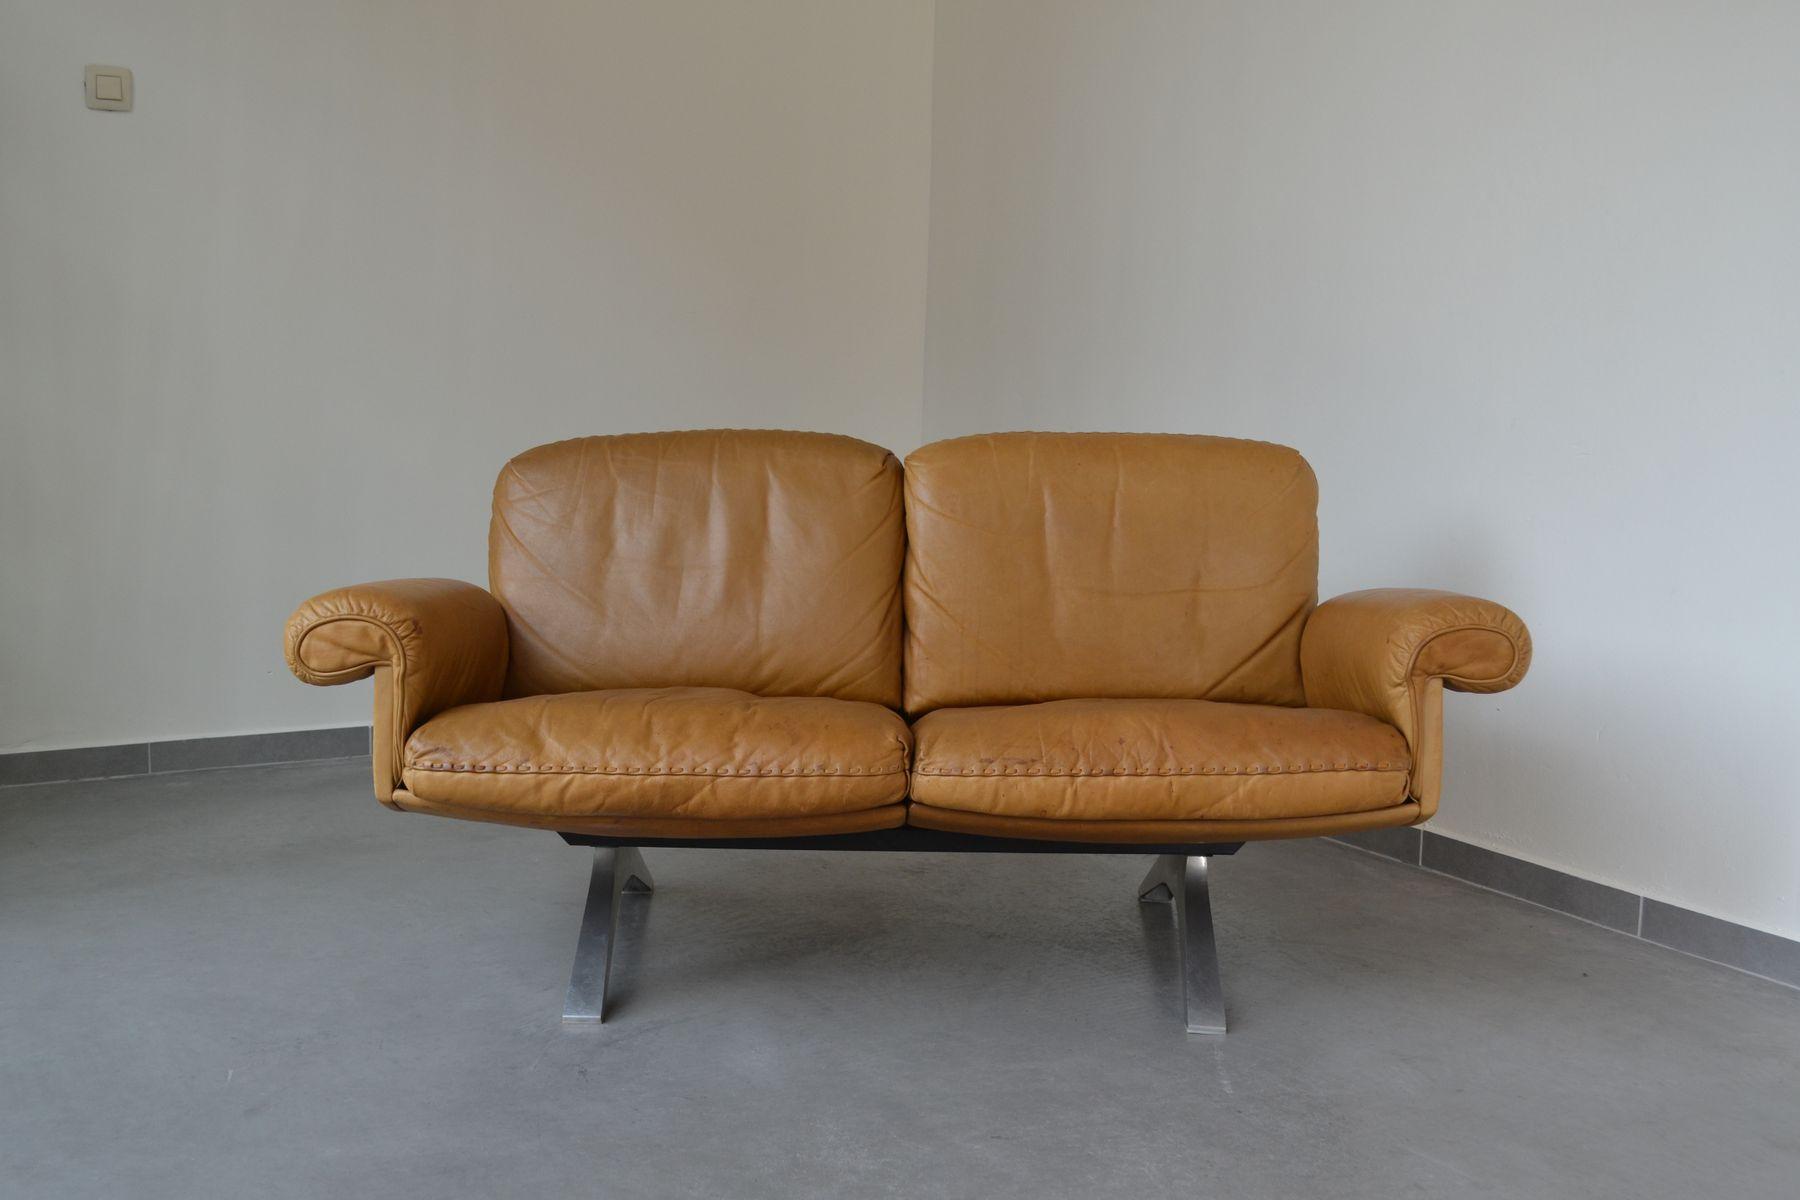 sofa hersteller schweiz full size of sofa xxl sofa sofa grau big einzigartig ohrensessel mit. Black Bedroom Furniture Sets. Home Design Ideas